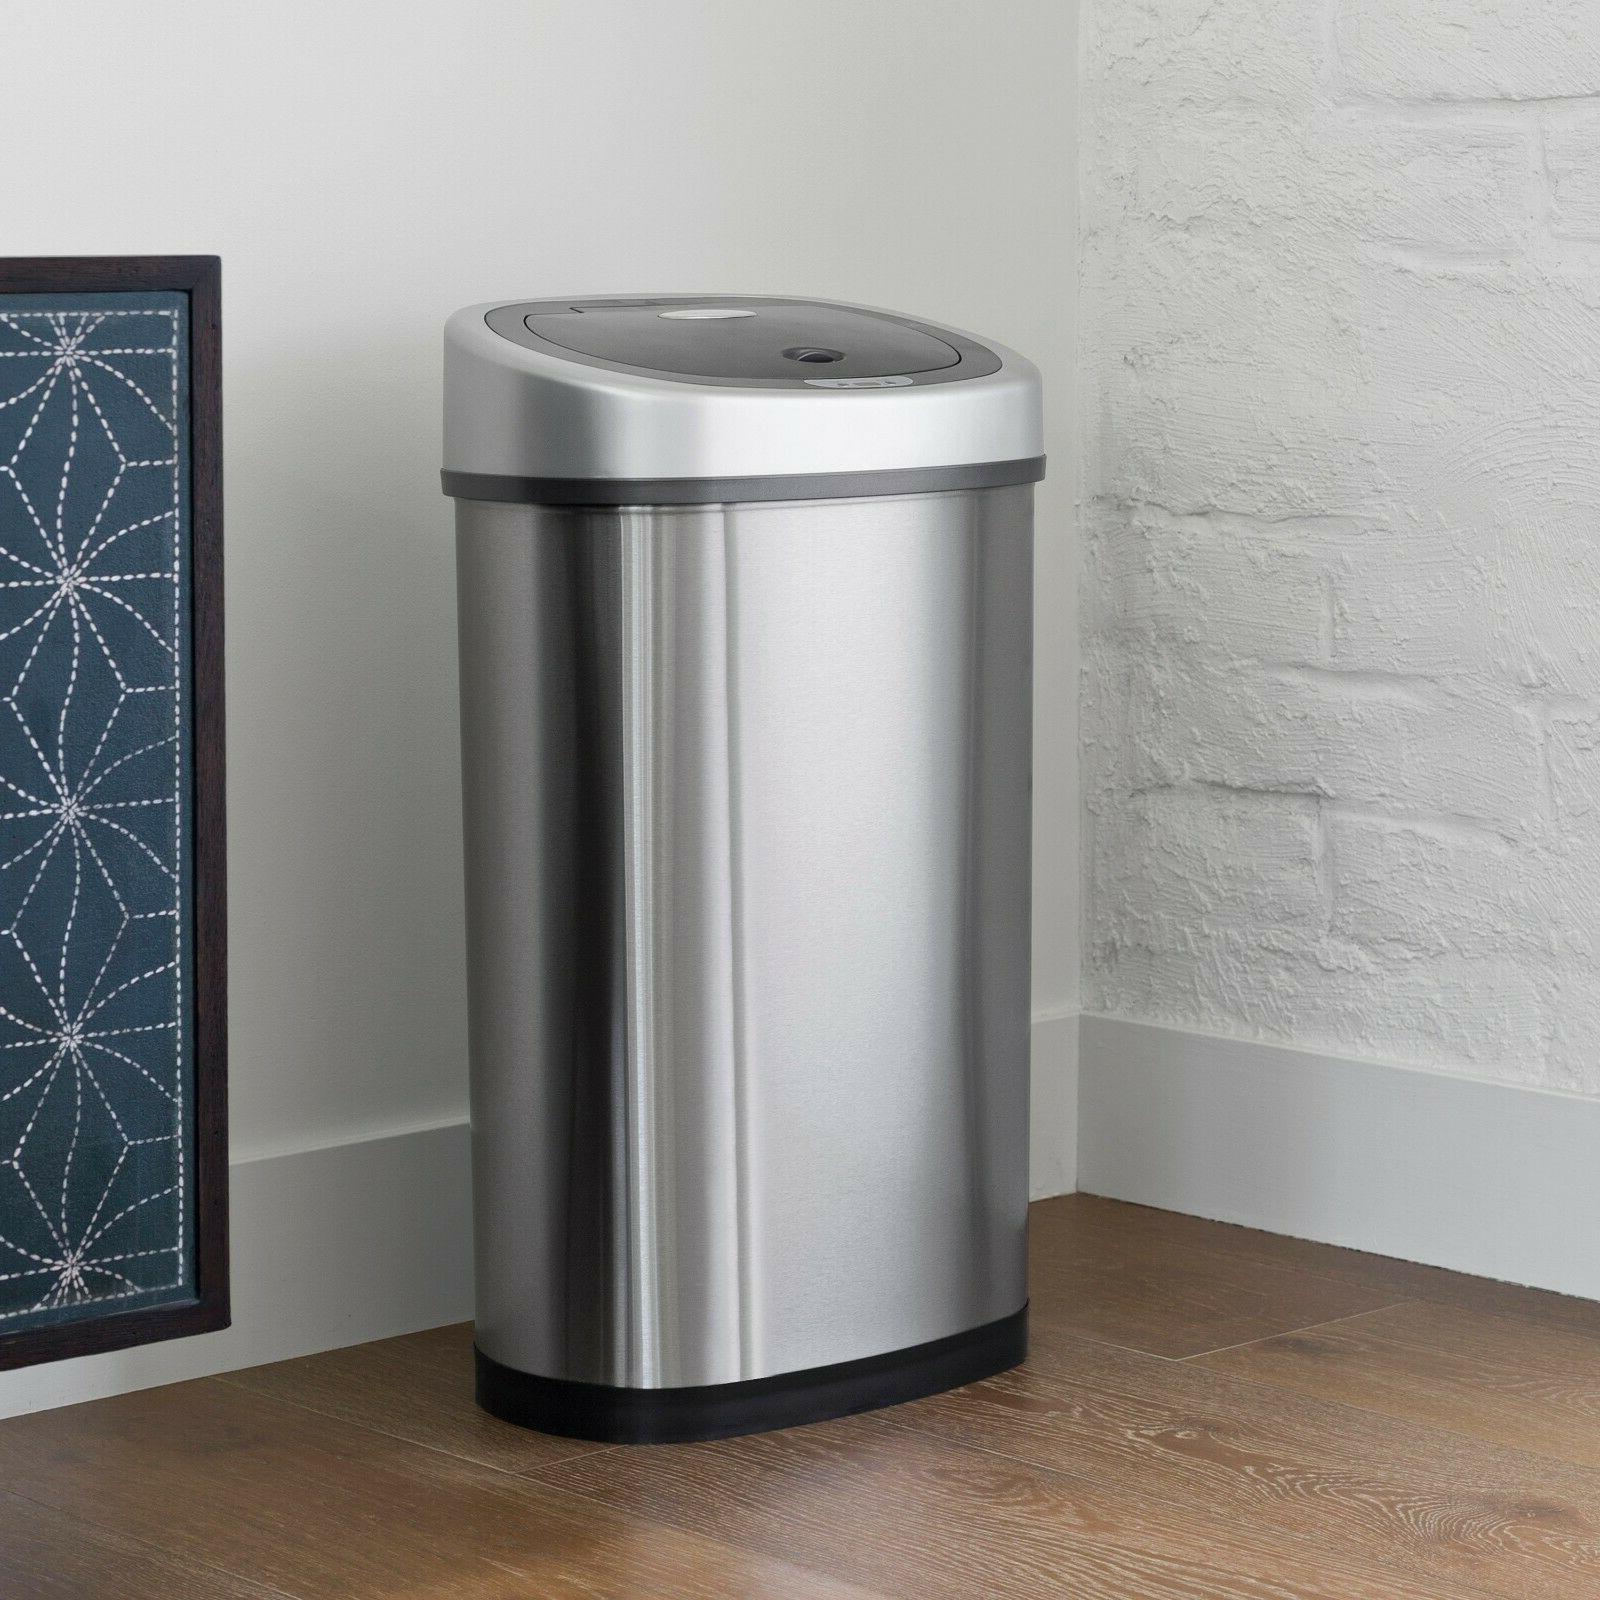 NineStars 13.2-Gallon Trash Can Multi Color